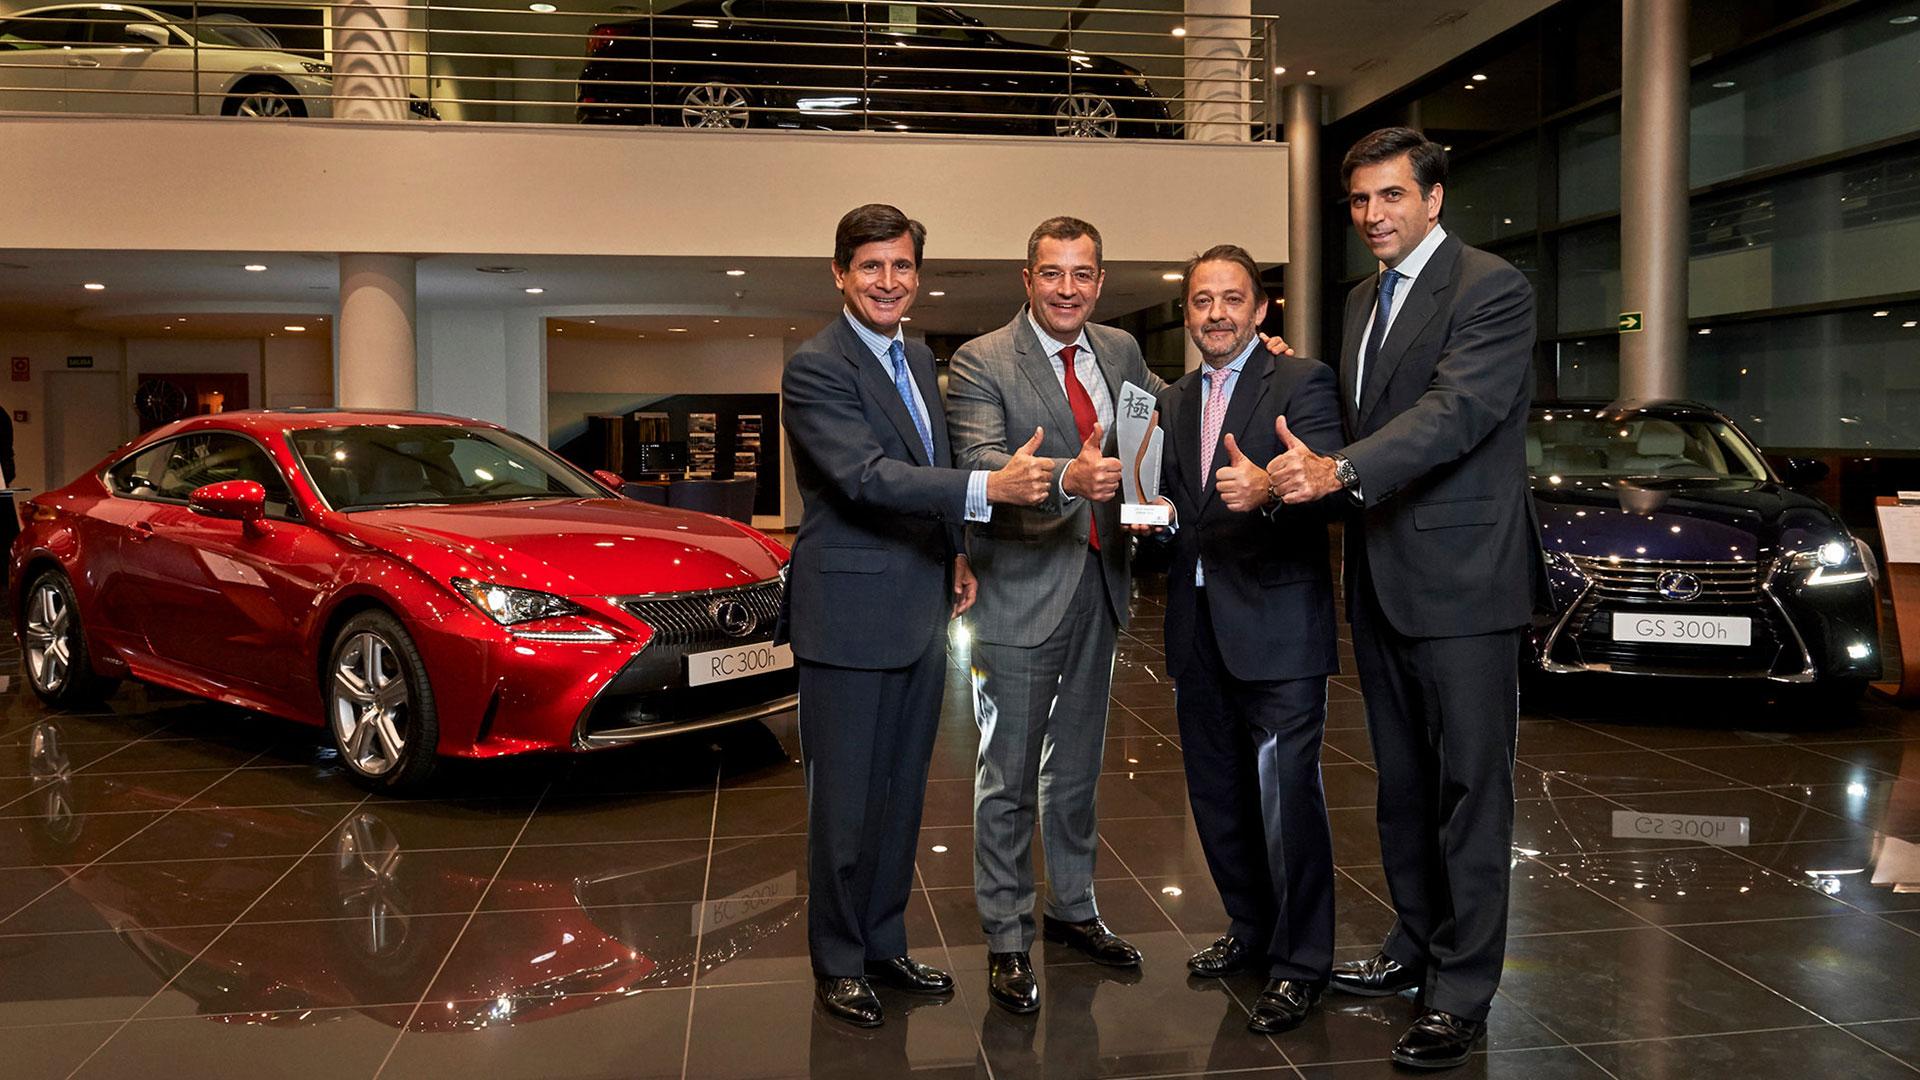 Lexus Castellón recibe el premio Kiwami 2015 hero asset